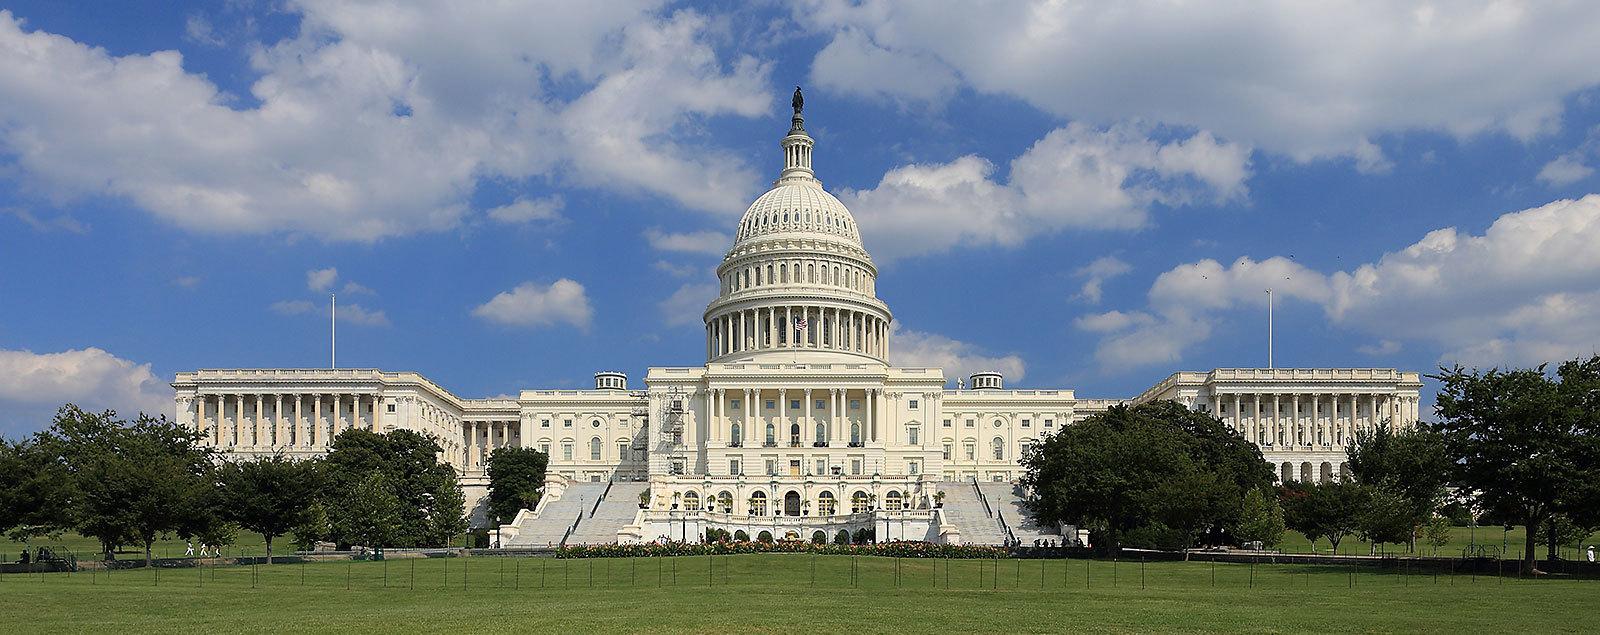 The Week ahead: House kicks off tax reform hearings | Treasury chief heads before Senate